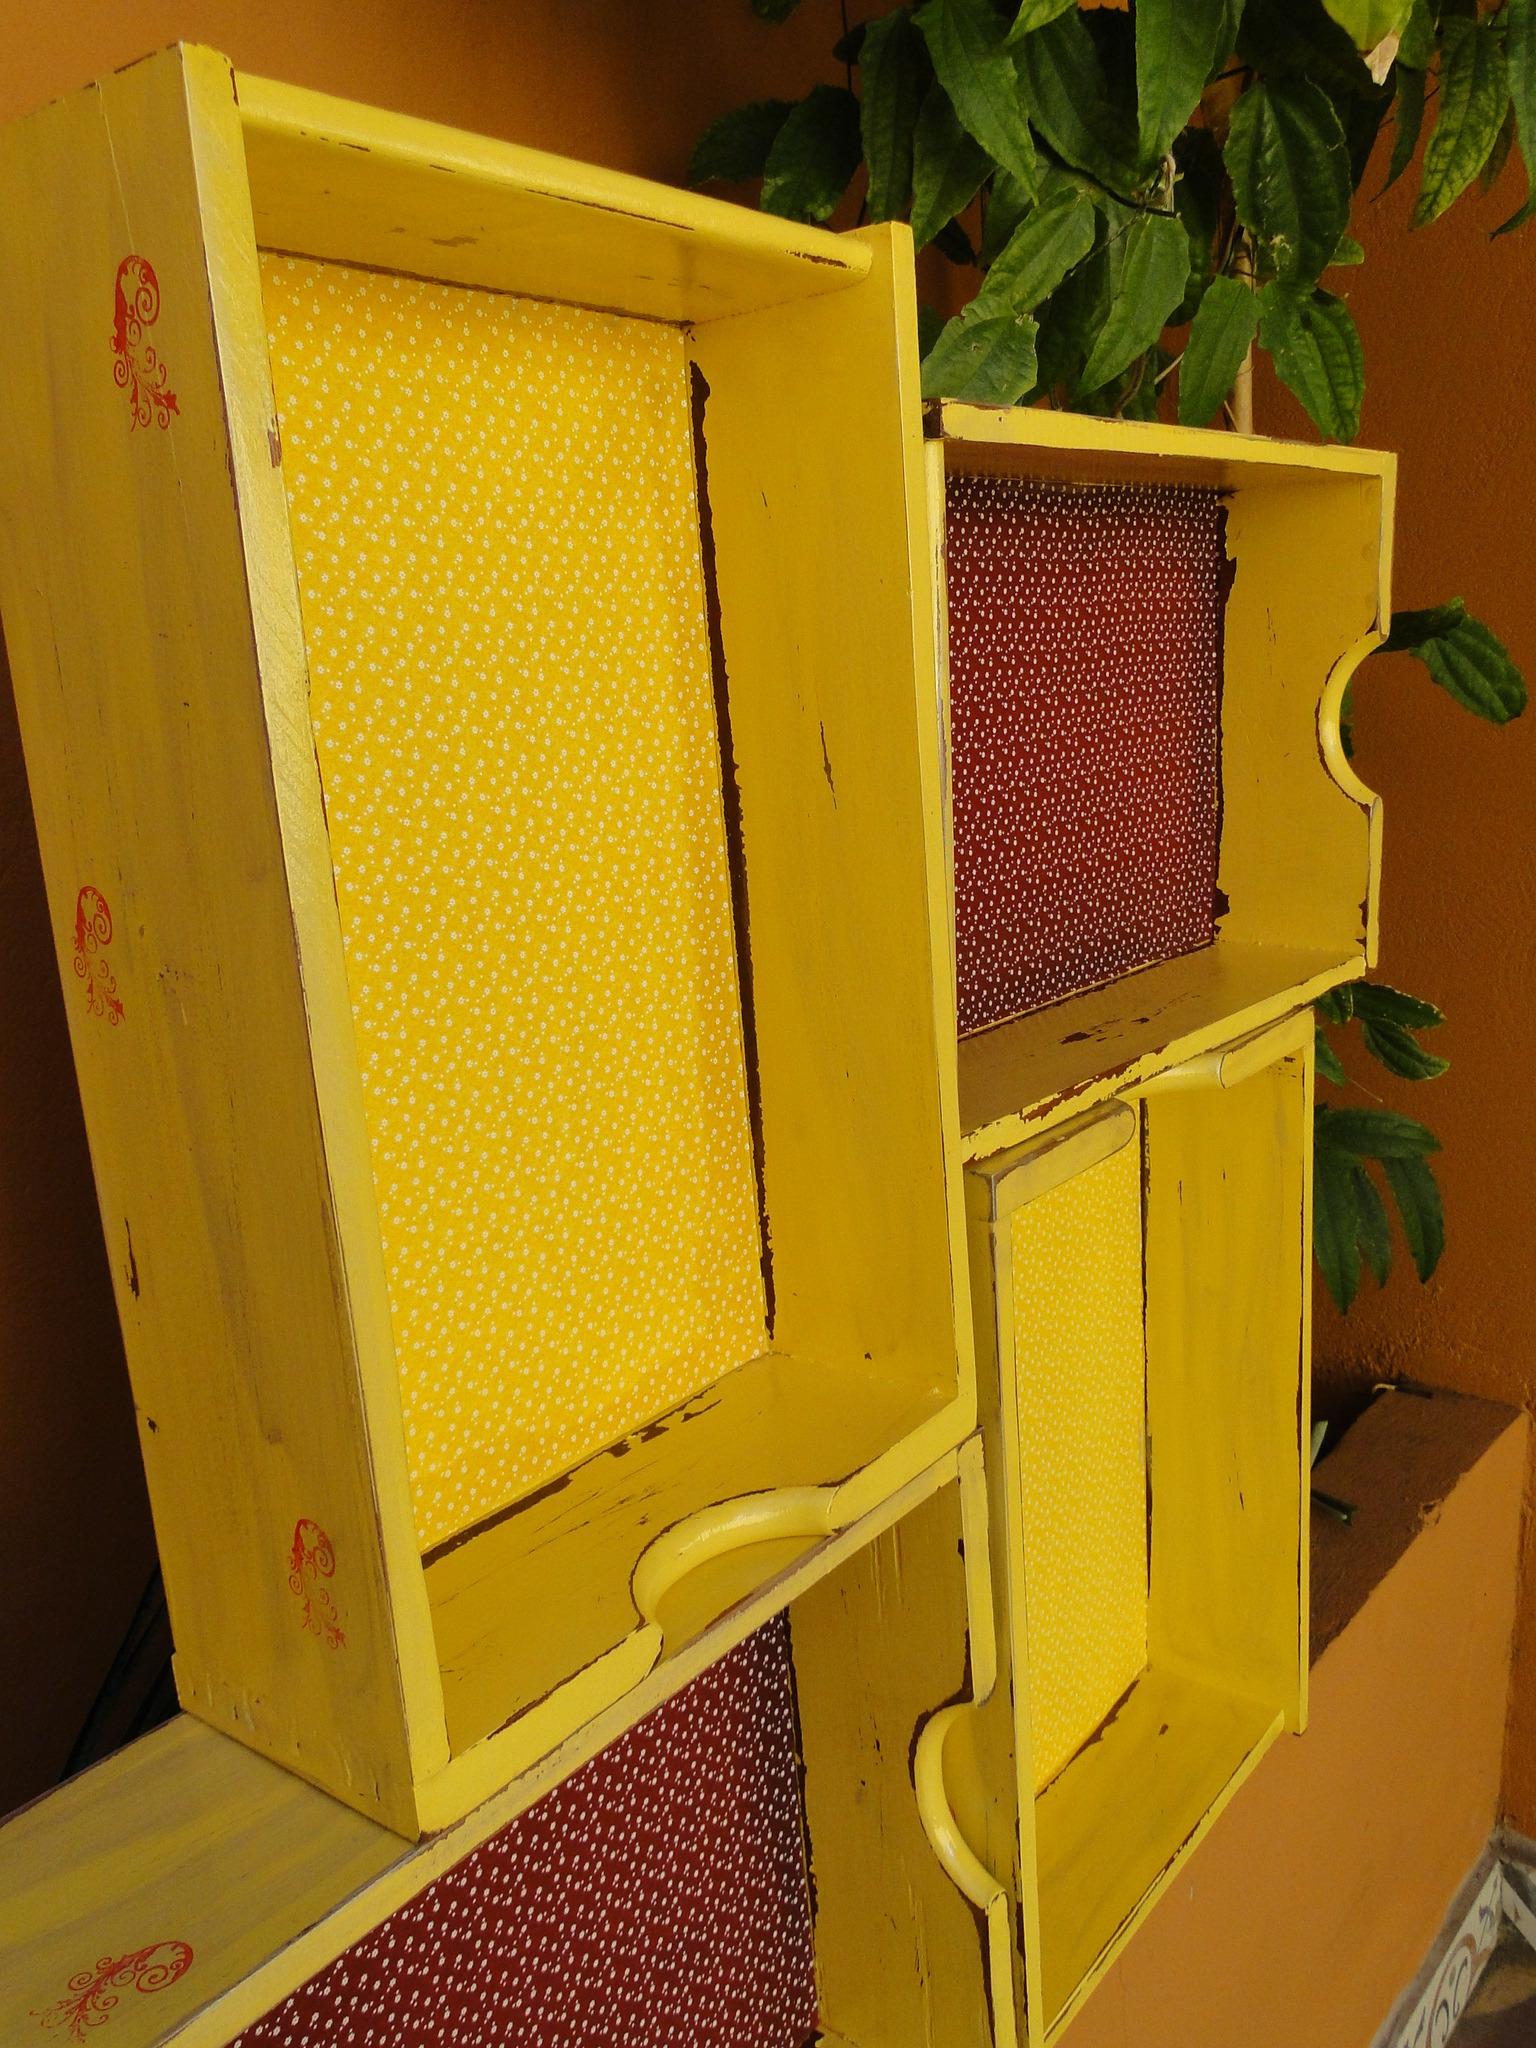 gavetas recicladas modulo estante gavetas recicladas modulo estante #BC8E0A 1536x2048